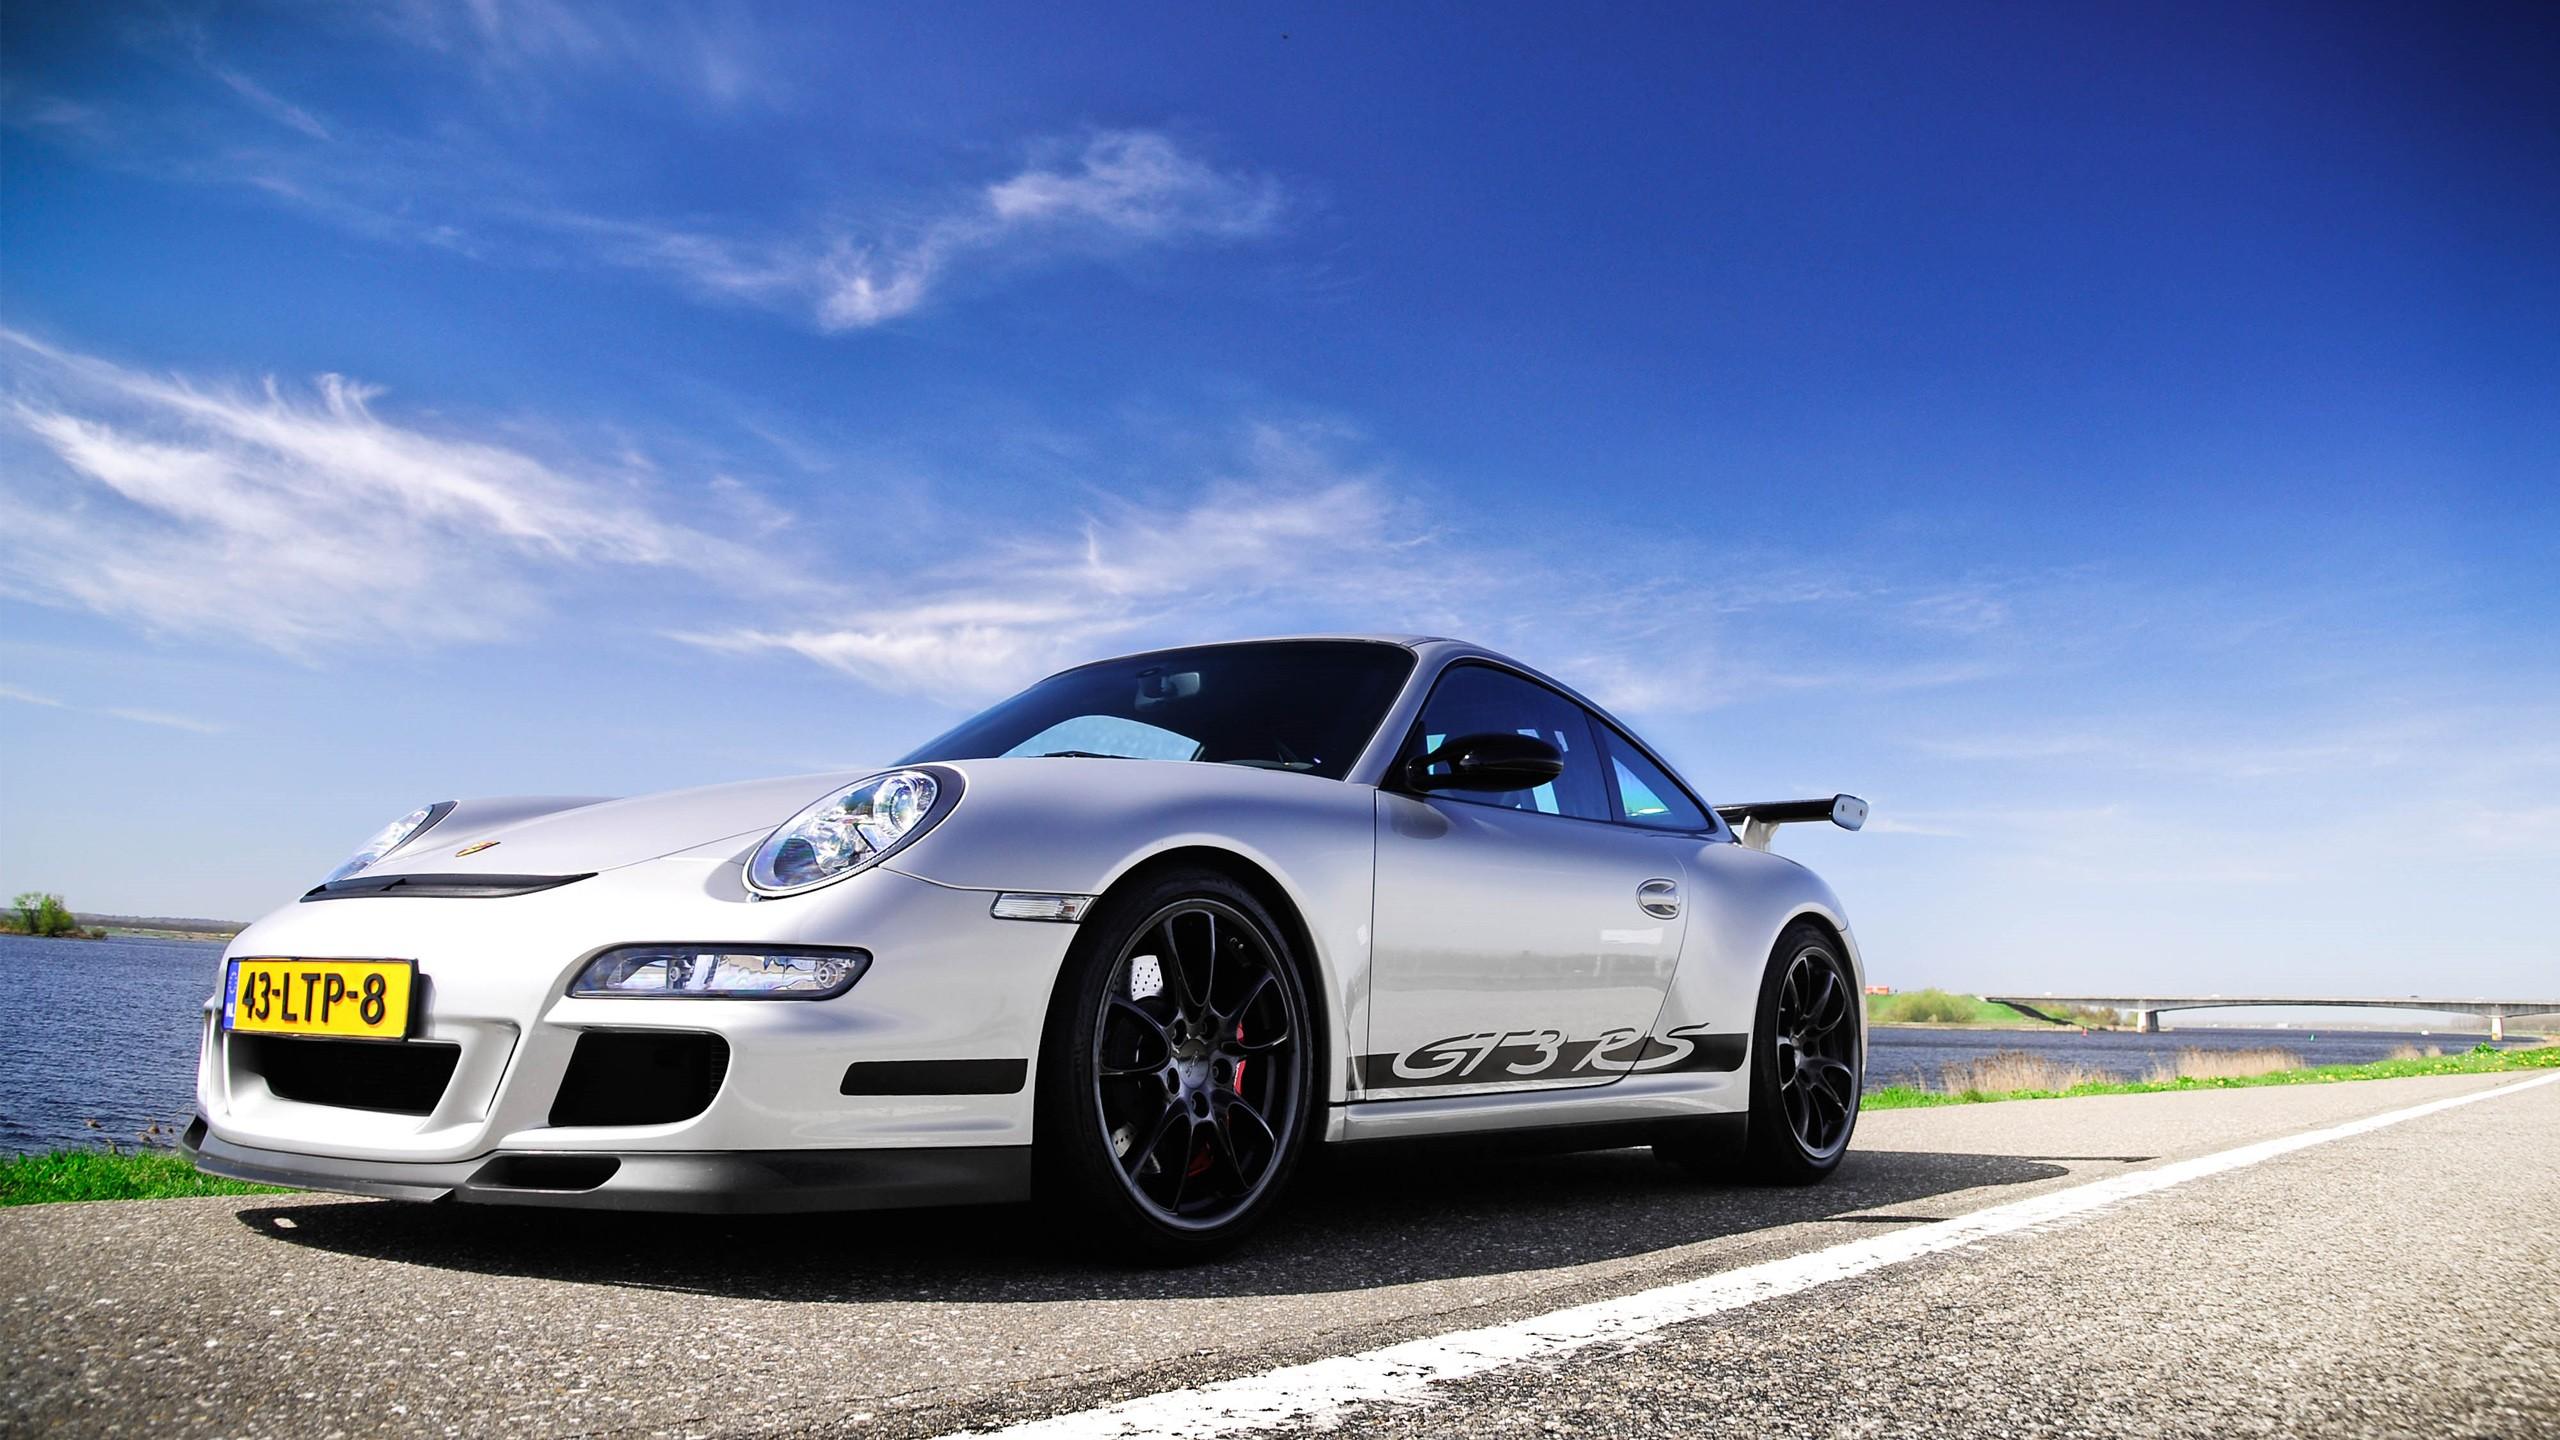 3d Car Wallpaper Hd Porsche 997 Gt3 Rs Wallpaper Hd Car Wallpapers Id 4334